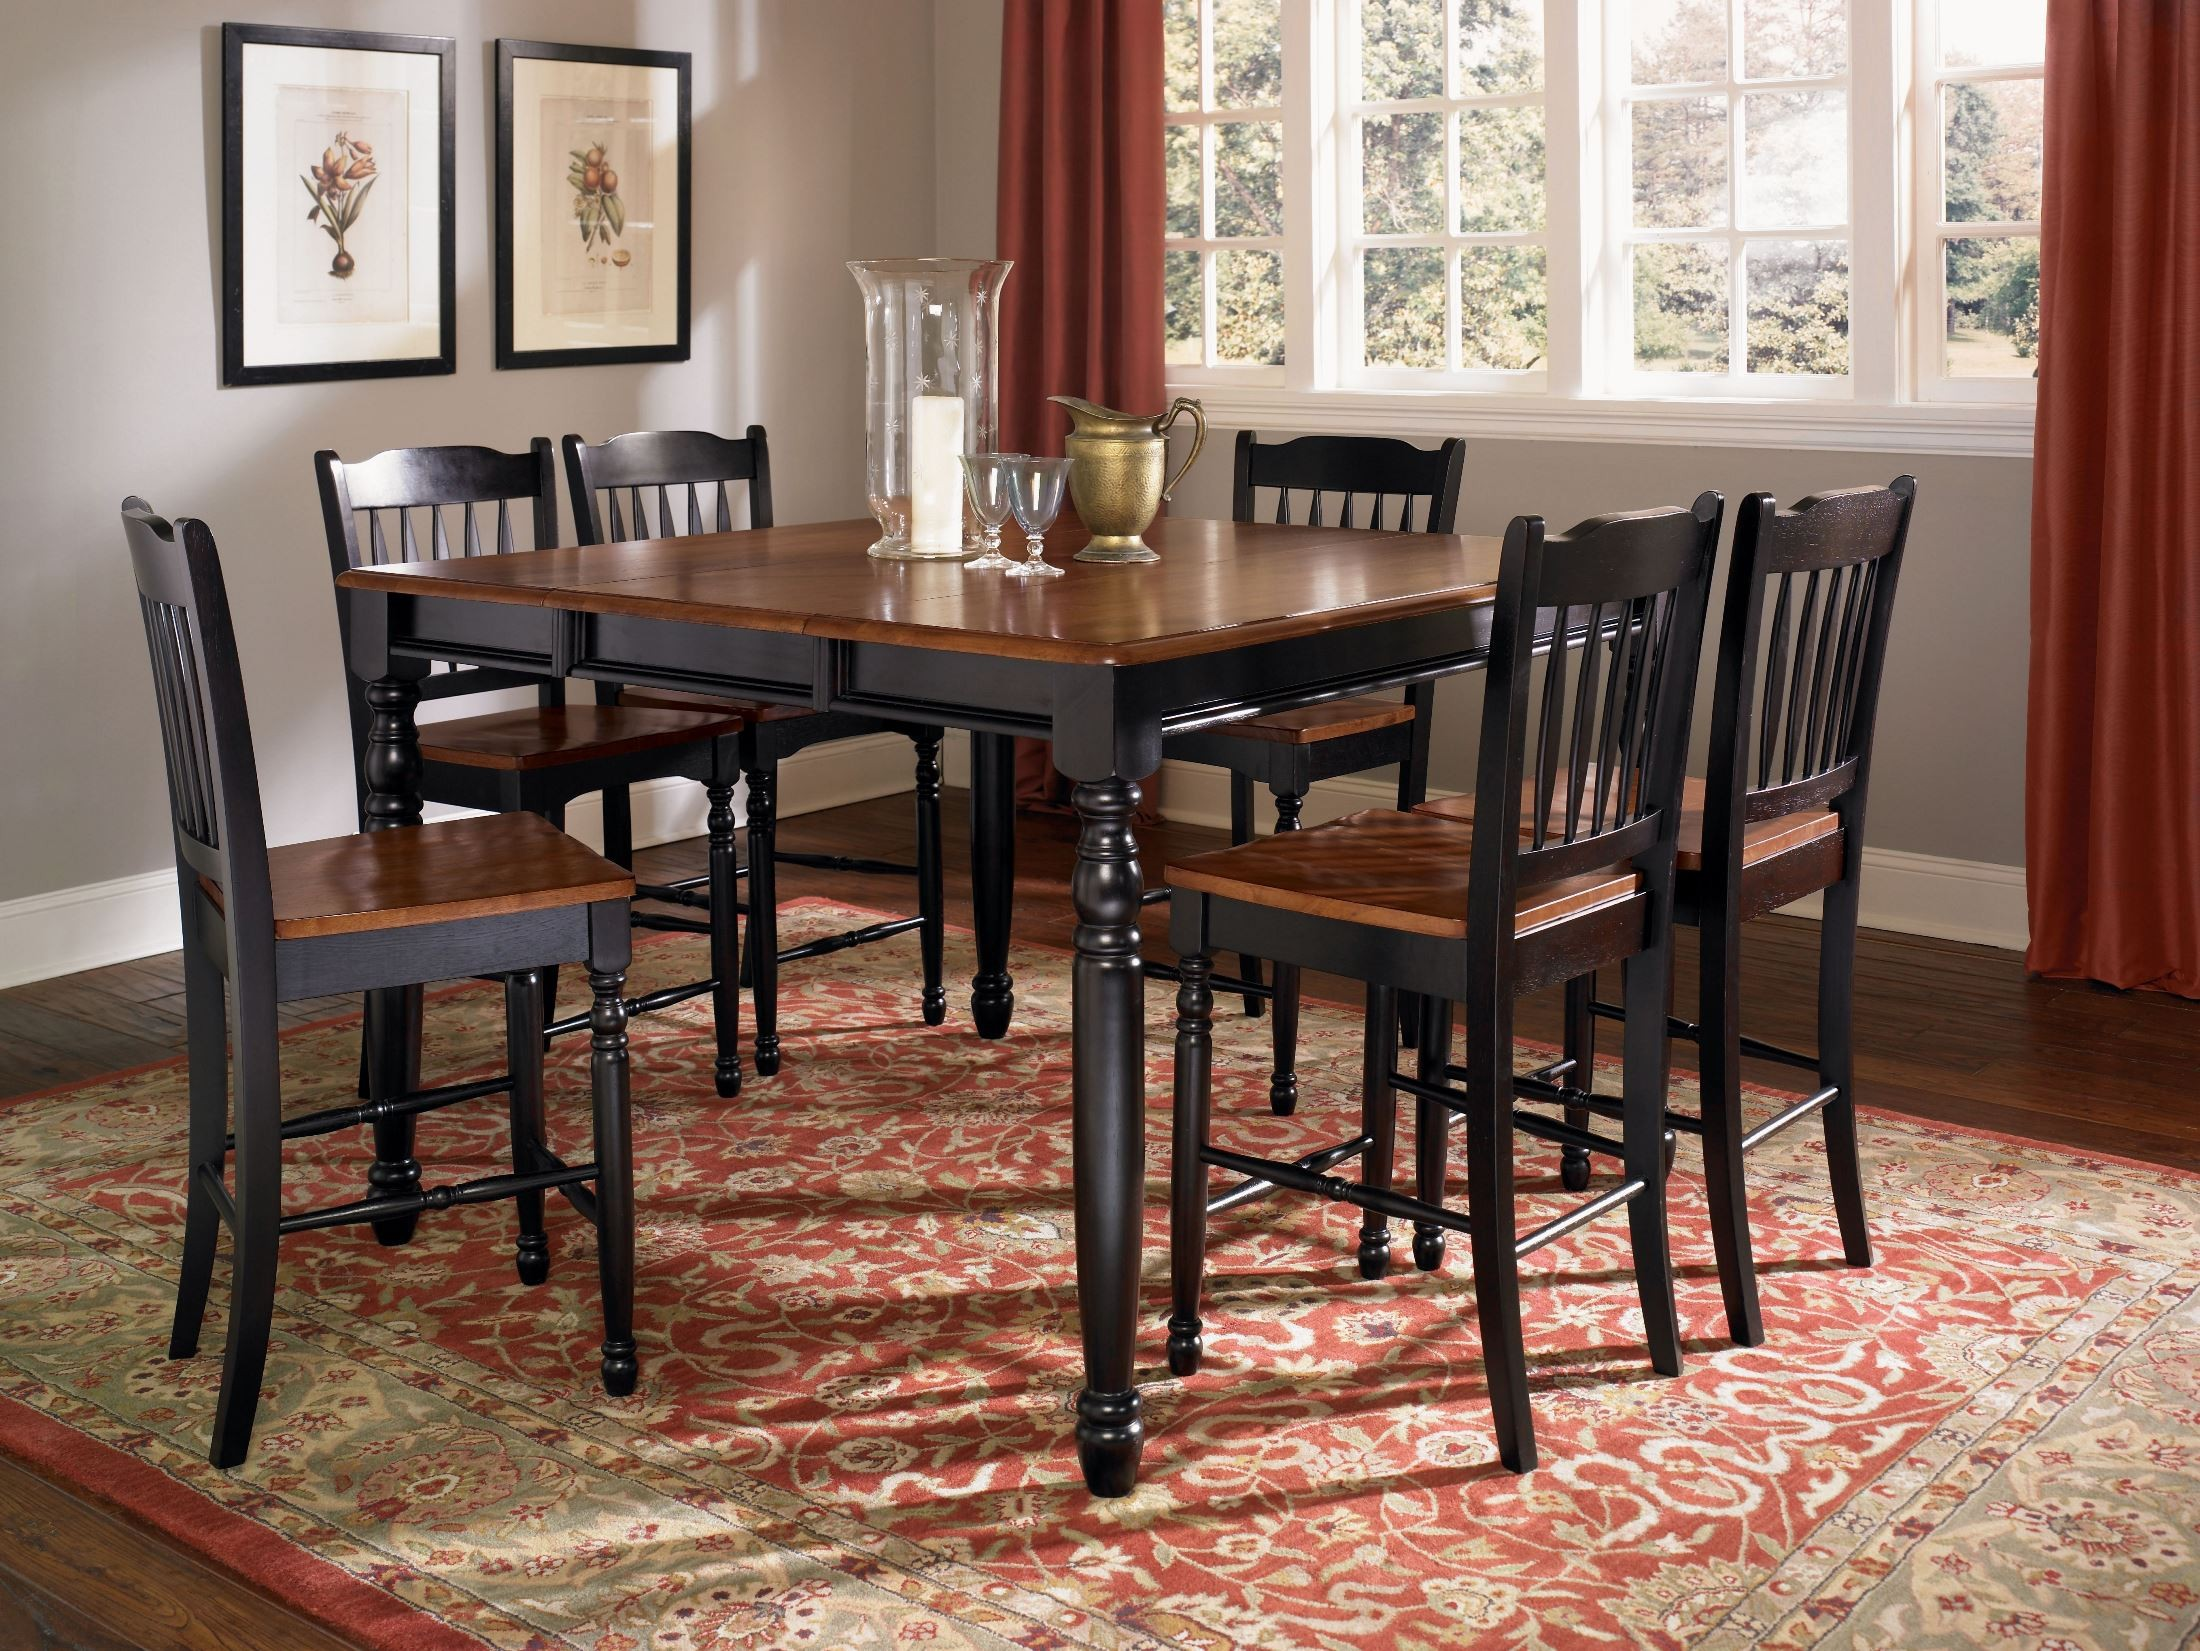 british isles 54 oak black extendable square counter height dining room set briob6720 a america. Black Bedroom Furniture Sets. Home Design Ideas